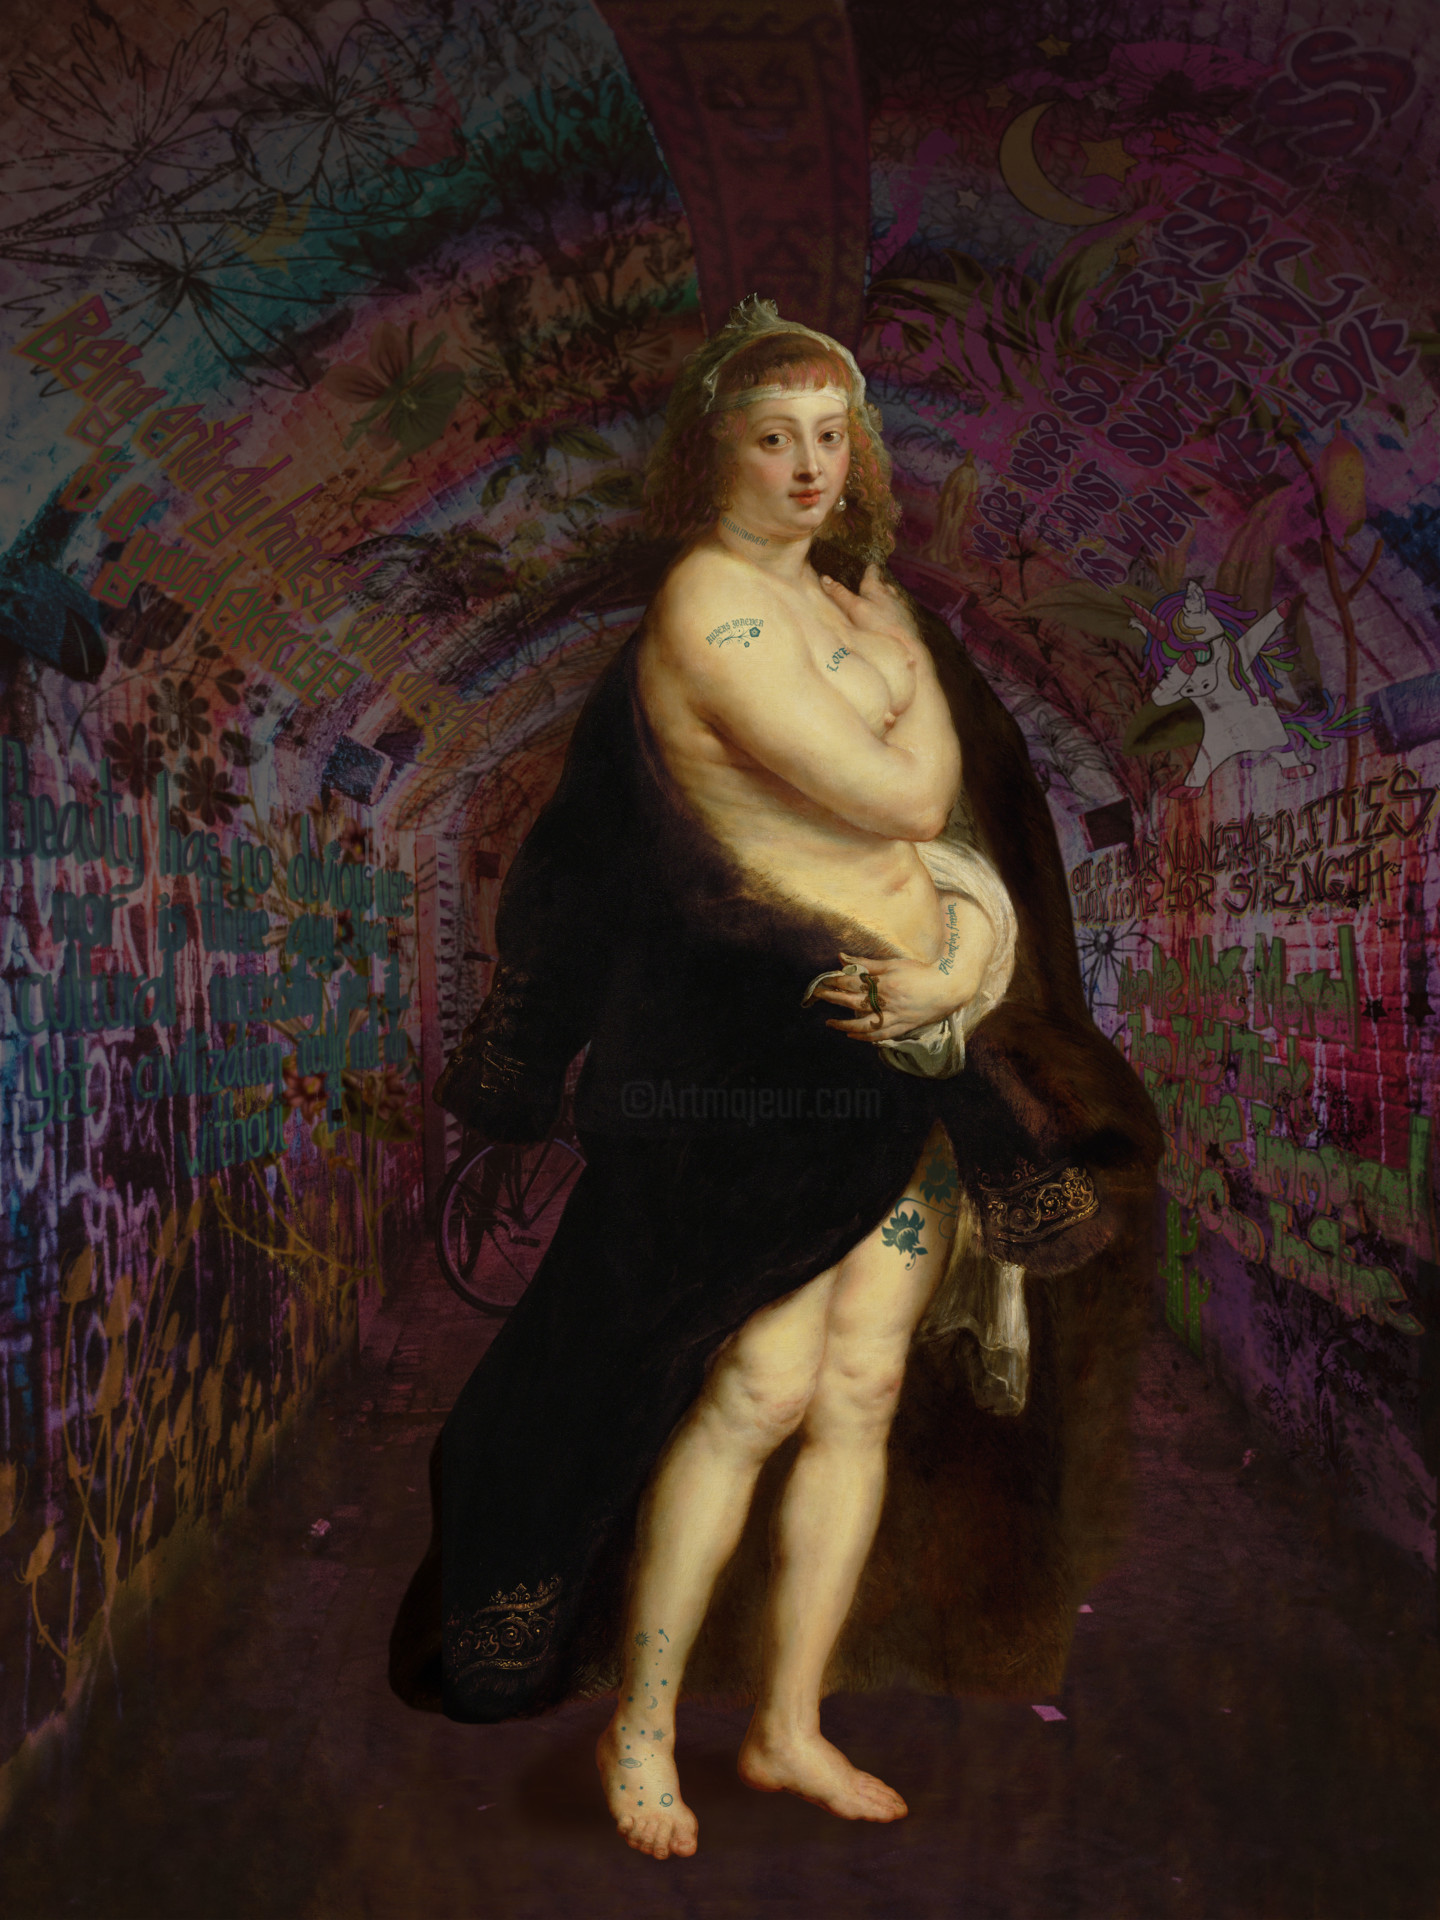 Wilhem Von Kalisz - Beauty has no obvious use